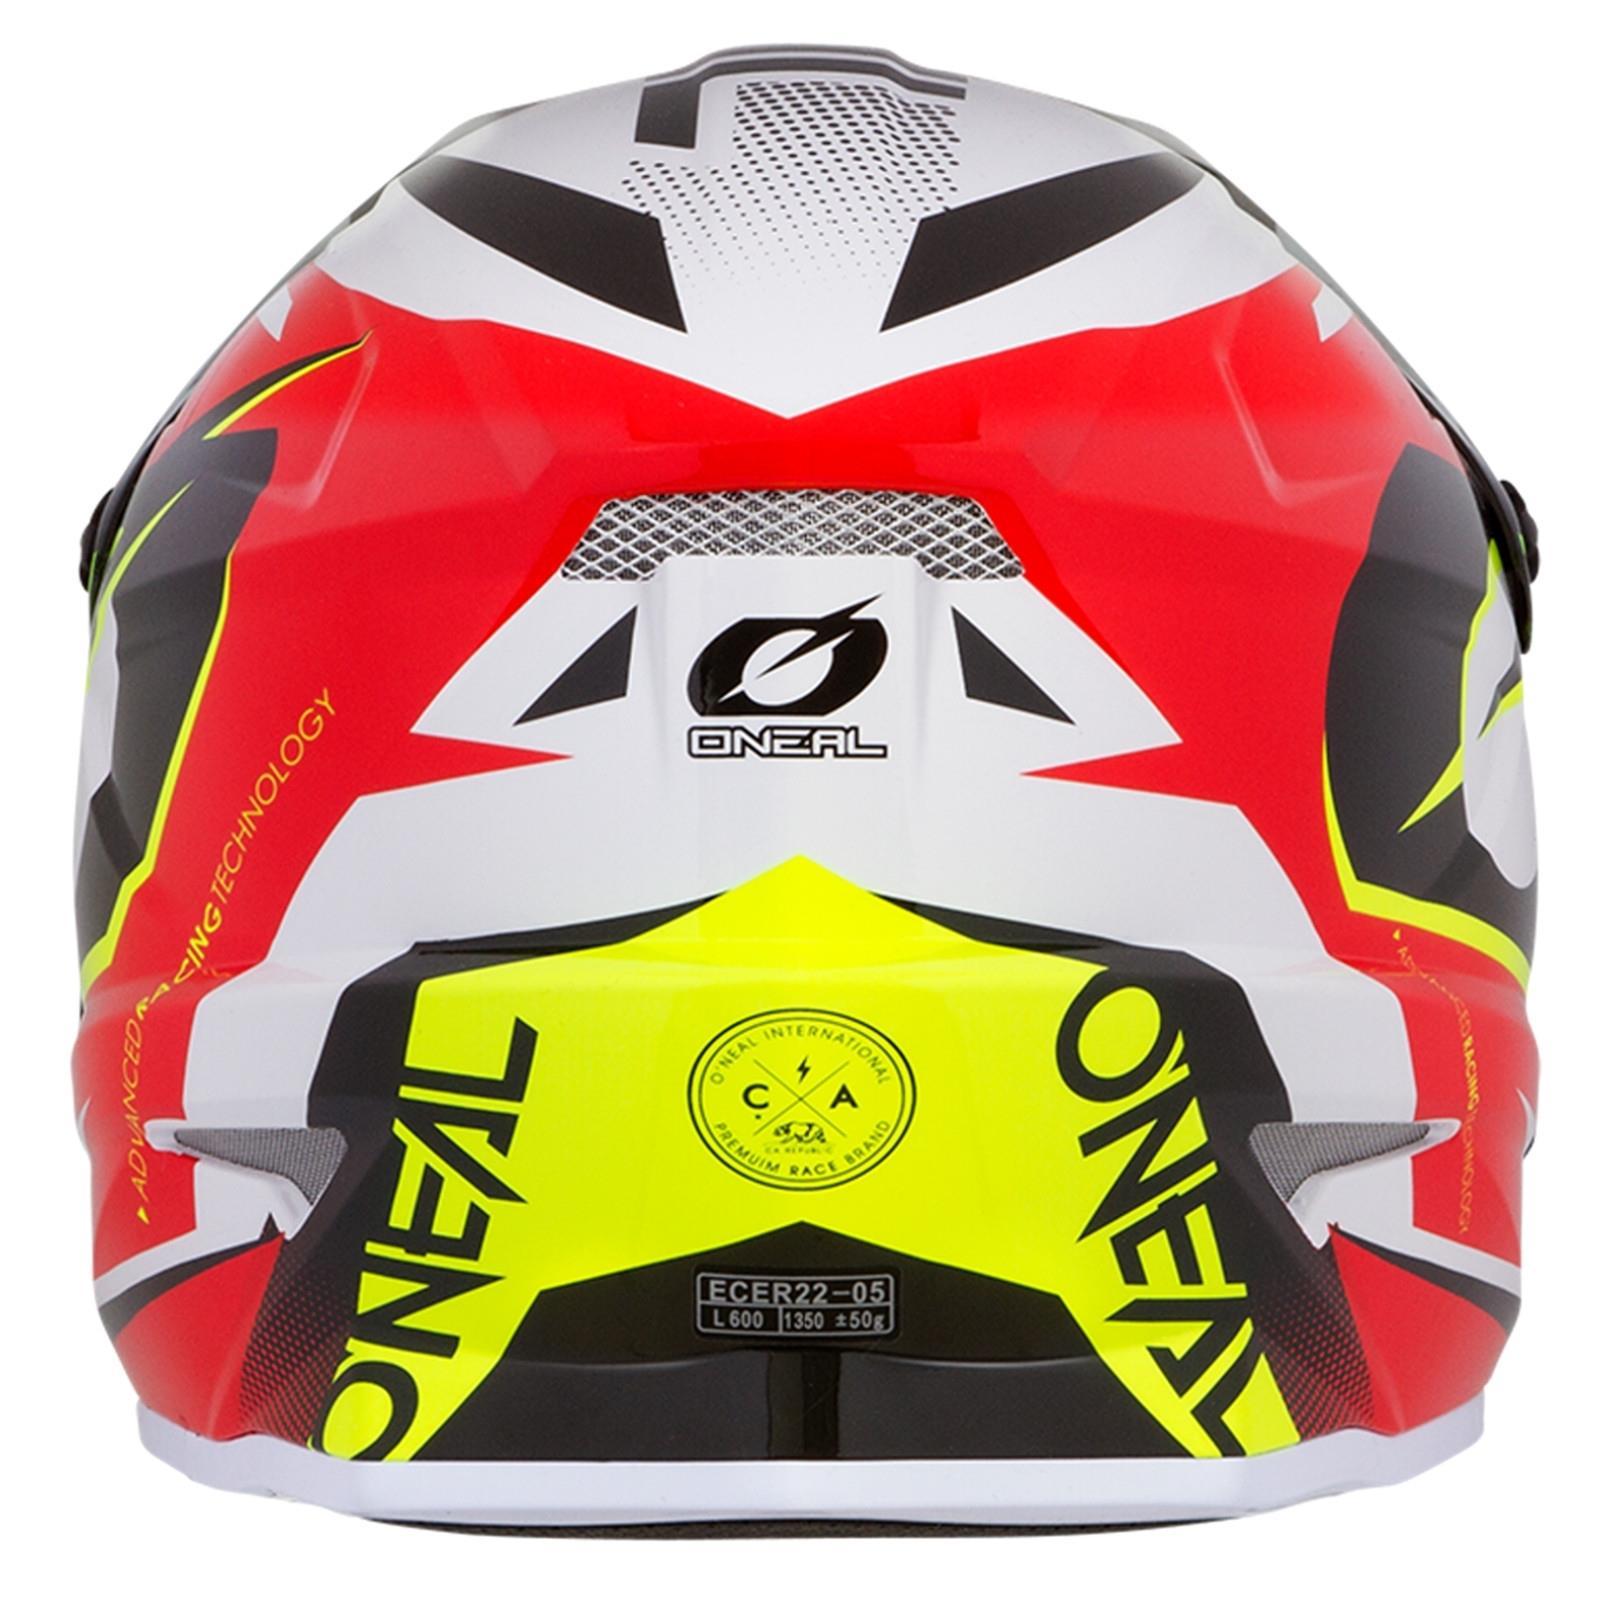 ONeal-Motocross-casco-MX-ENDURO-MOTO-BICI-FUORISTRADA-CROSS-Series-Adventure miniatura 45